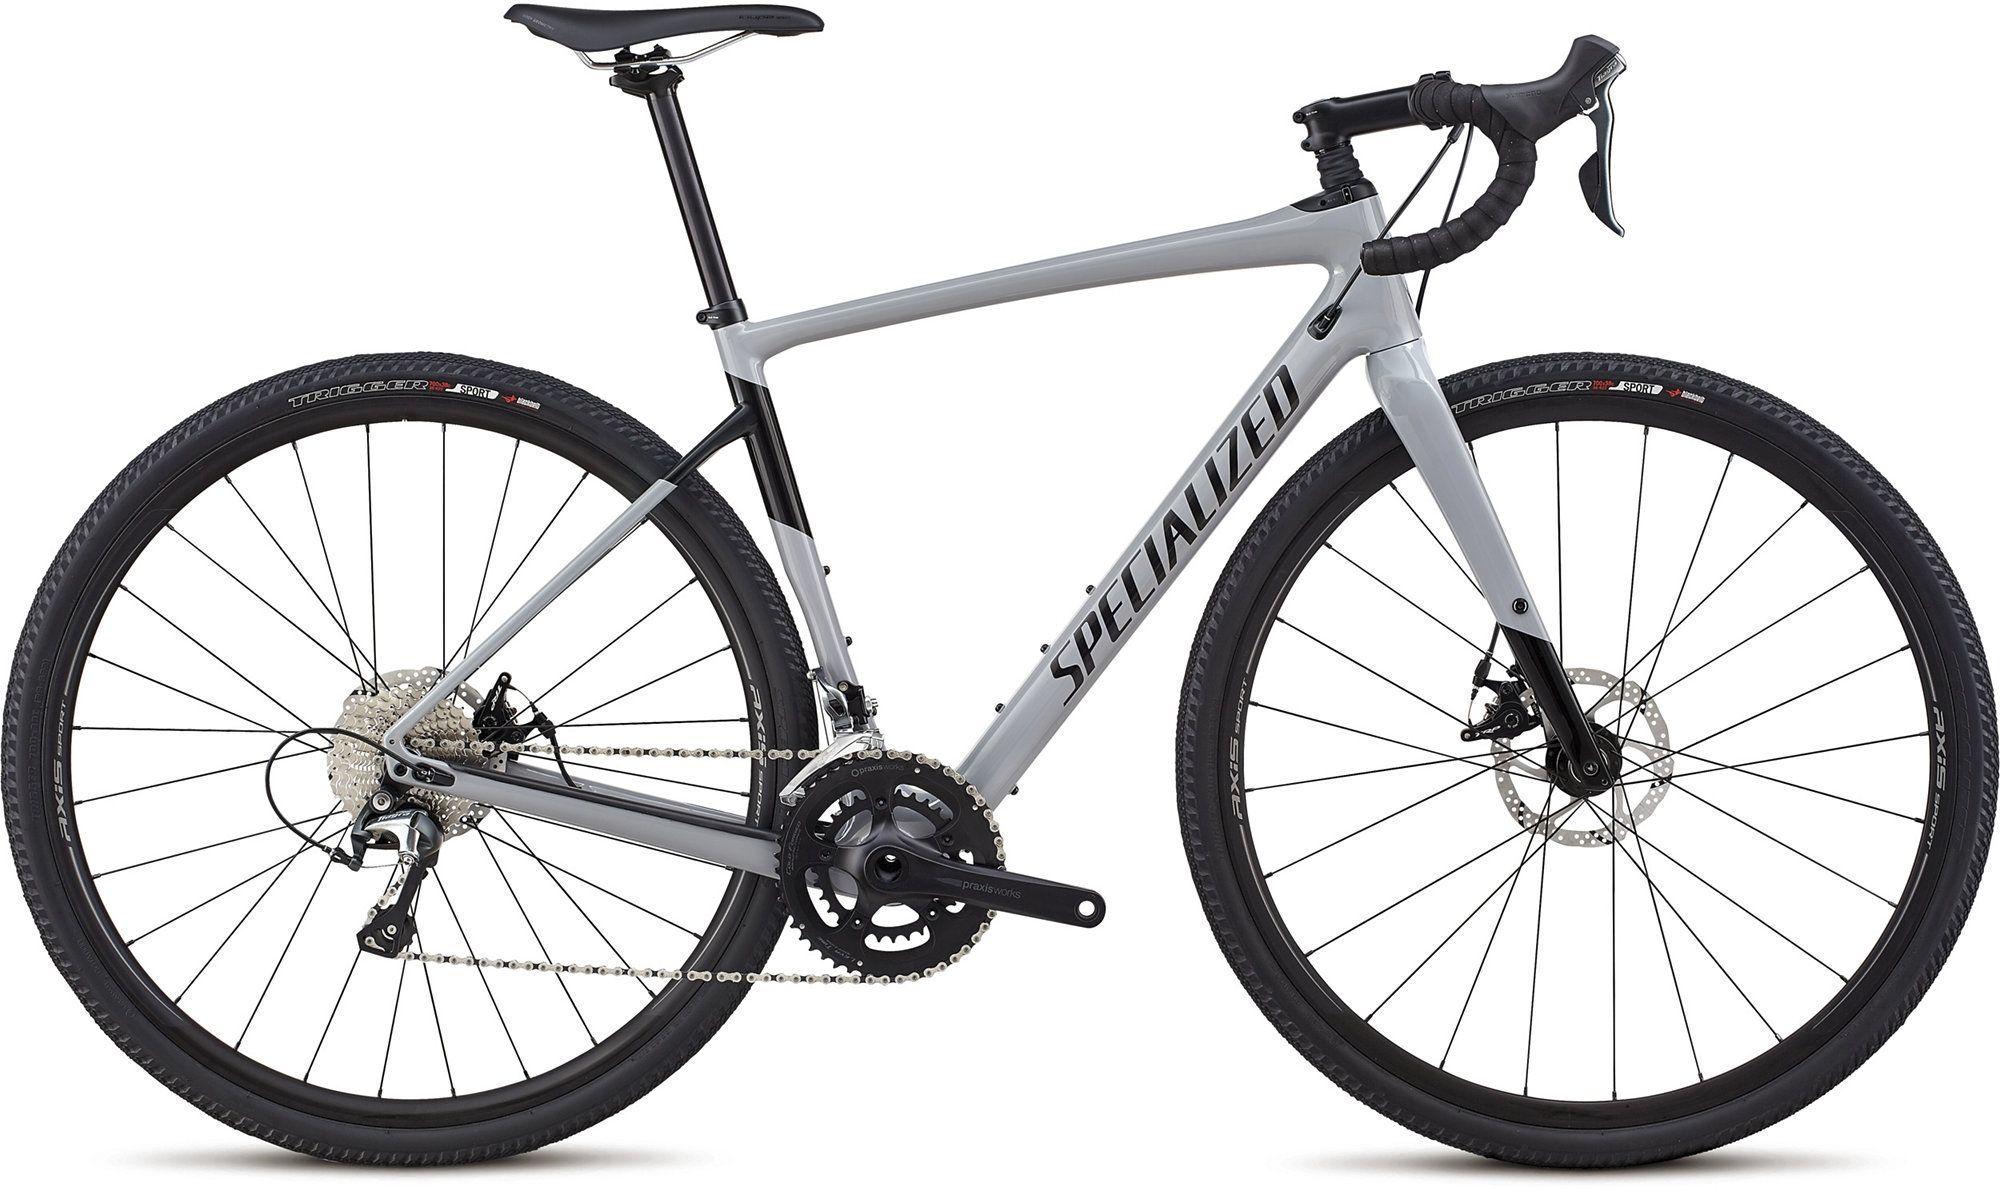 2018 Men S Diverge Sport 2000 00 Gravel Bike Bicycle